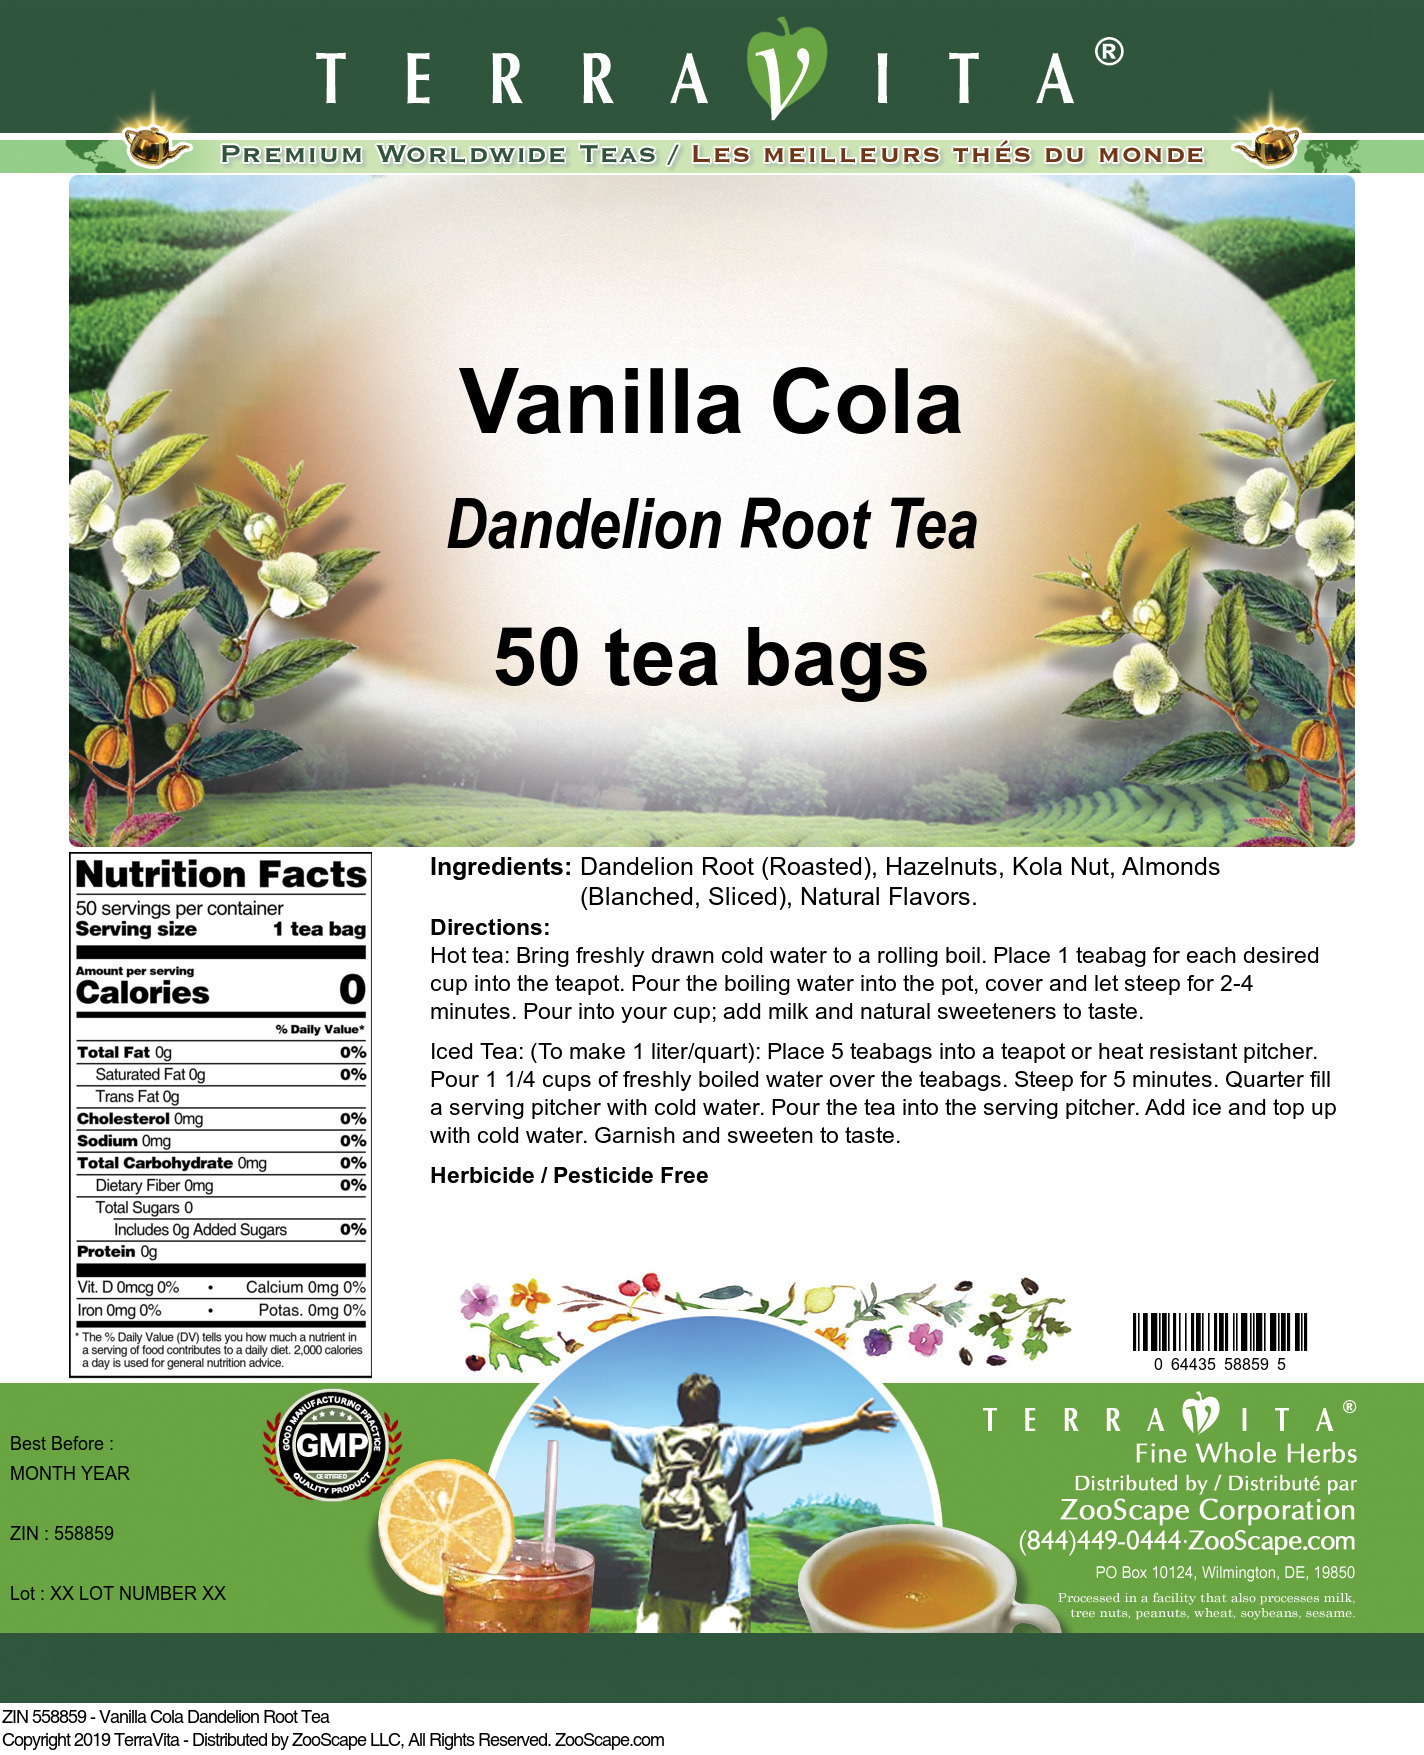 Vanilla Cola Dandelion Root Tea